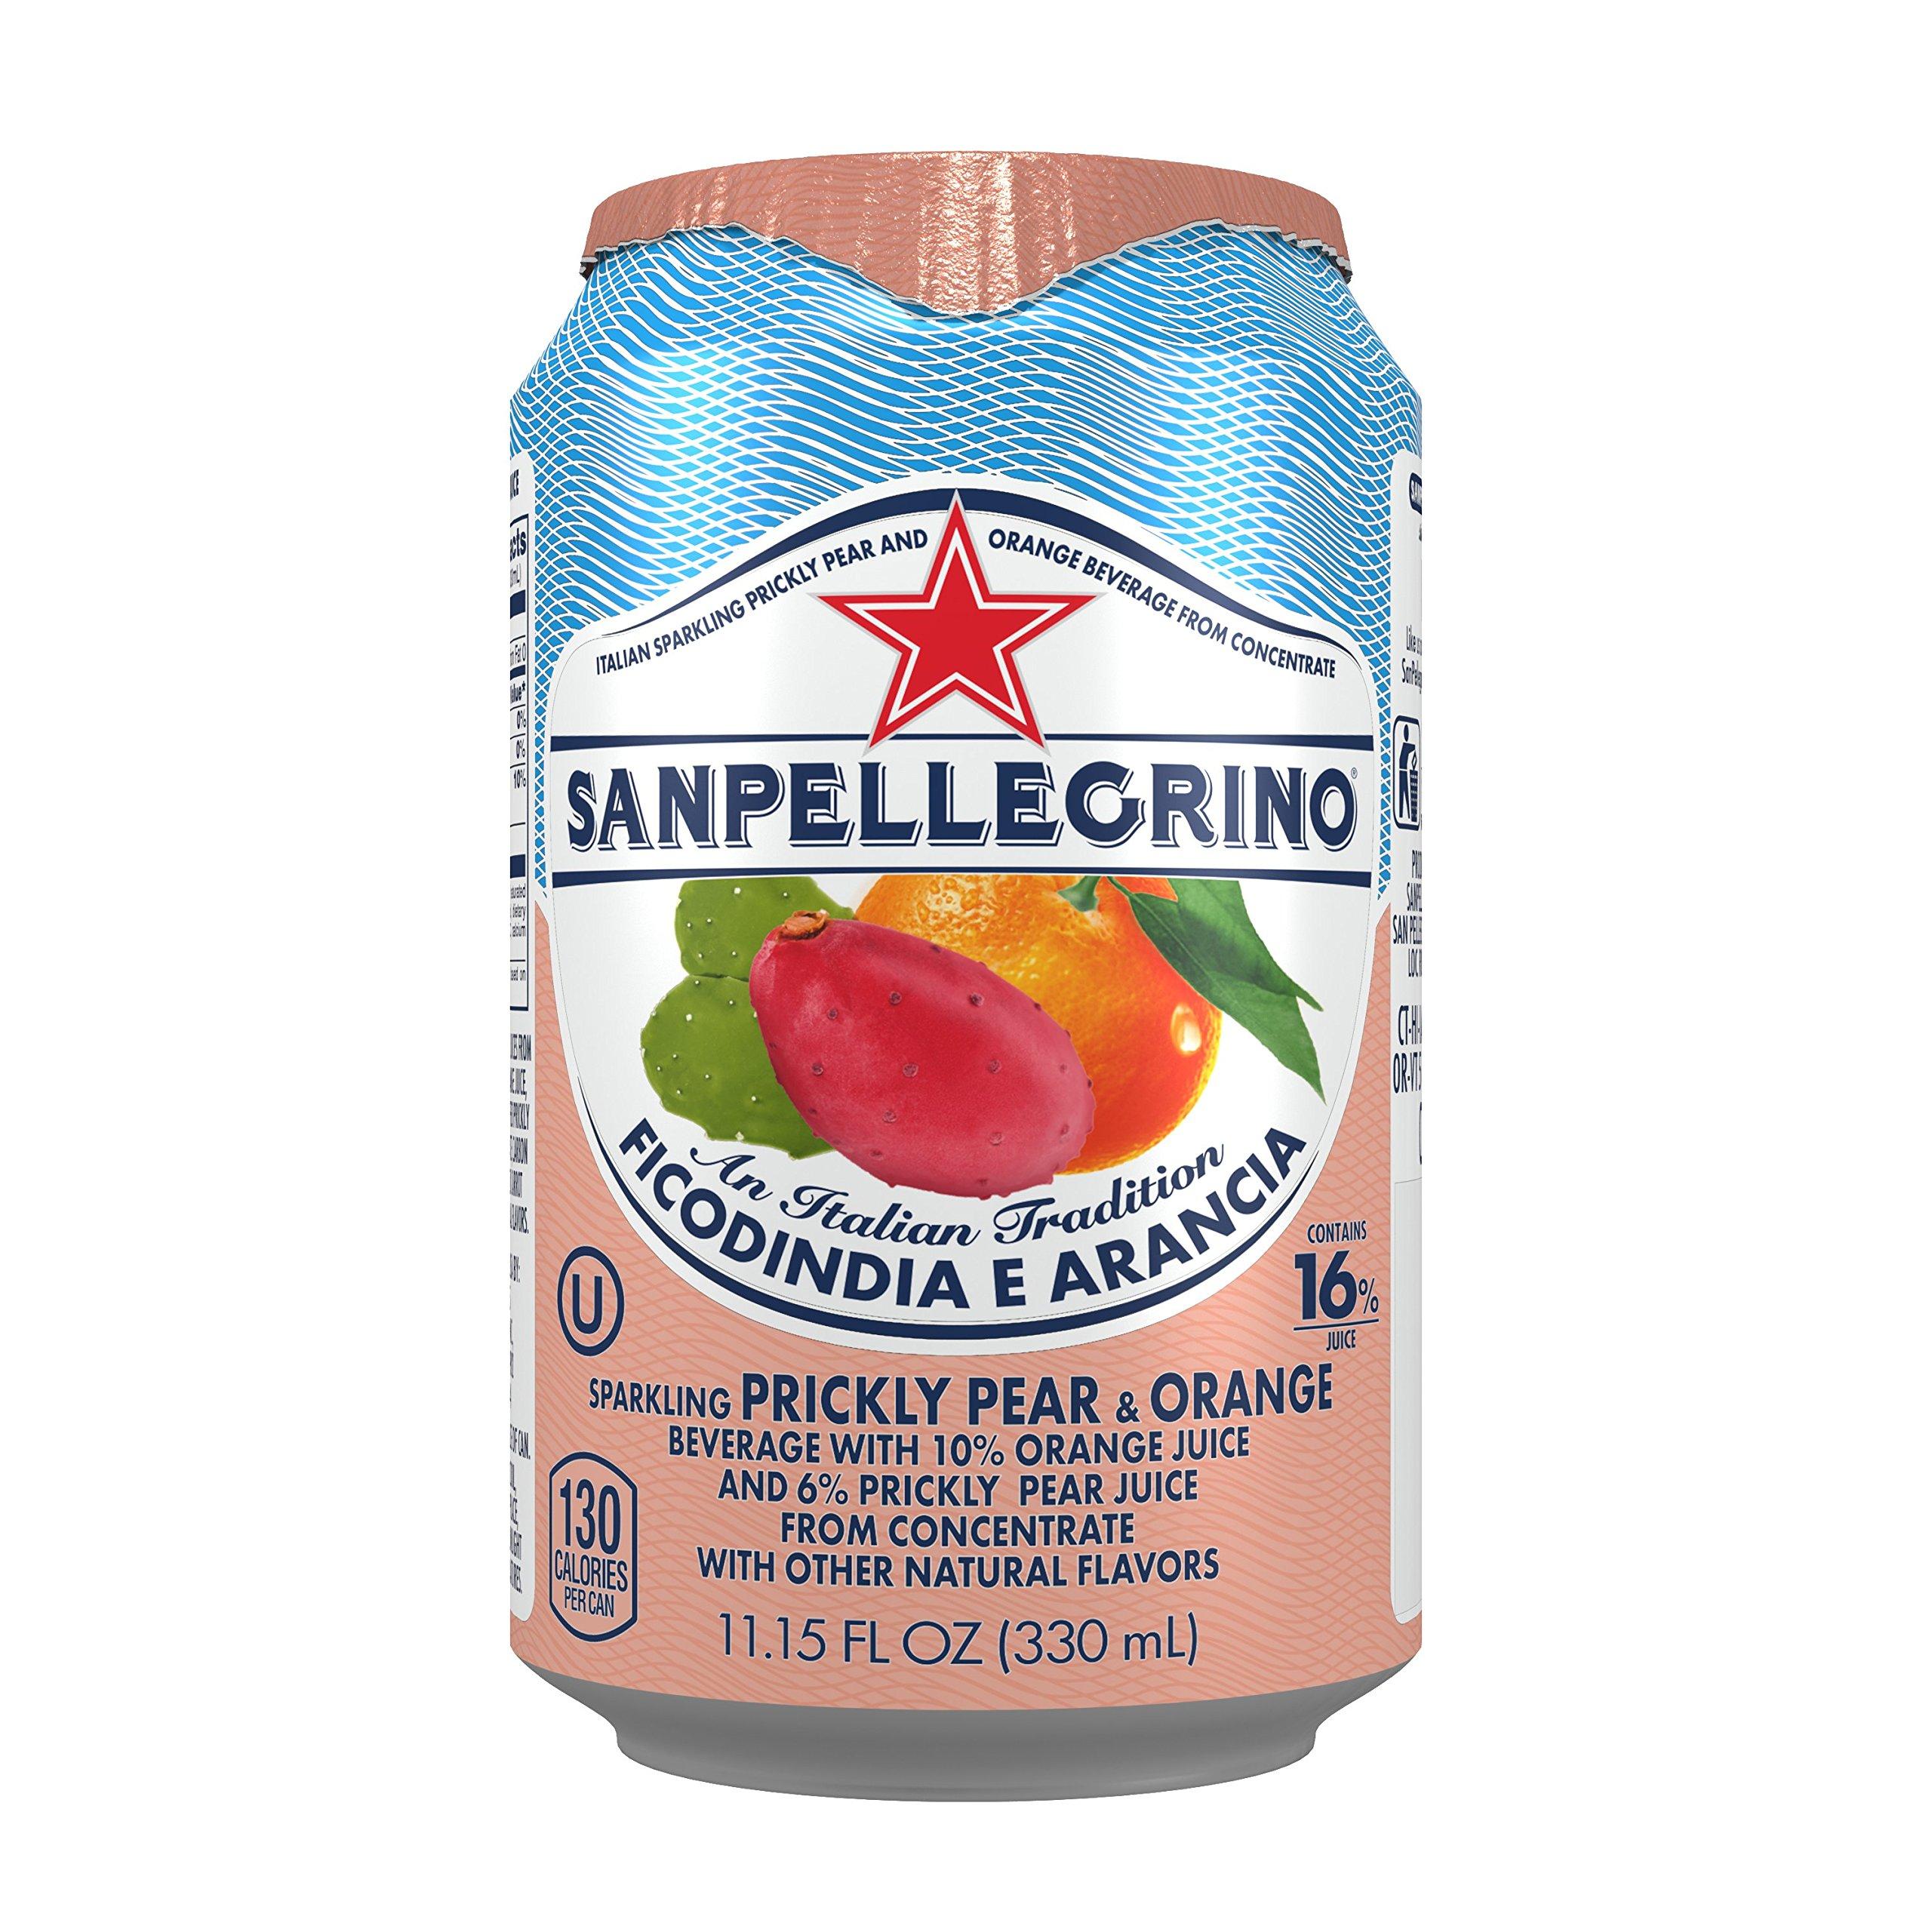 Sanpellegrino Prickly Pear and Orange Sparkling Fruit Beverage, 11.15 fl oz. Cans (24 Count)